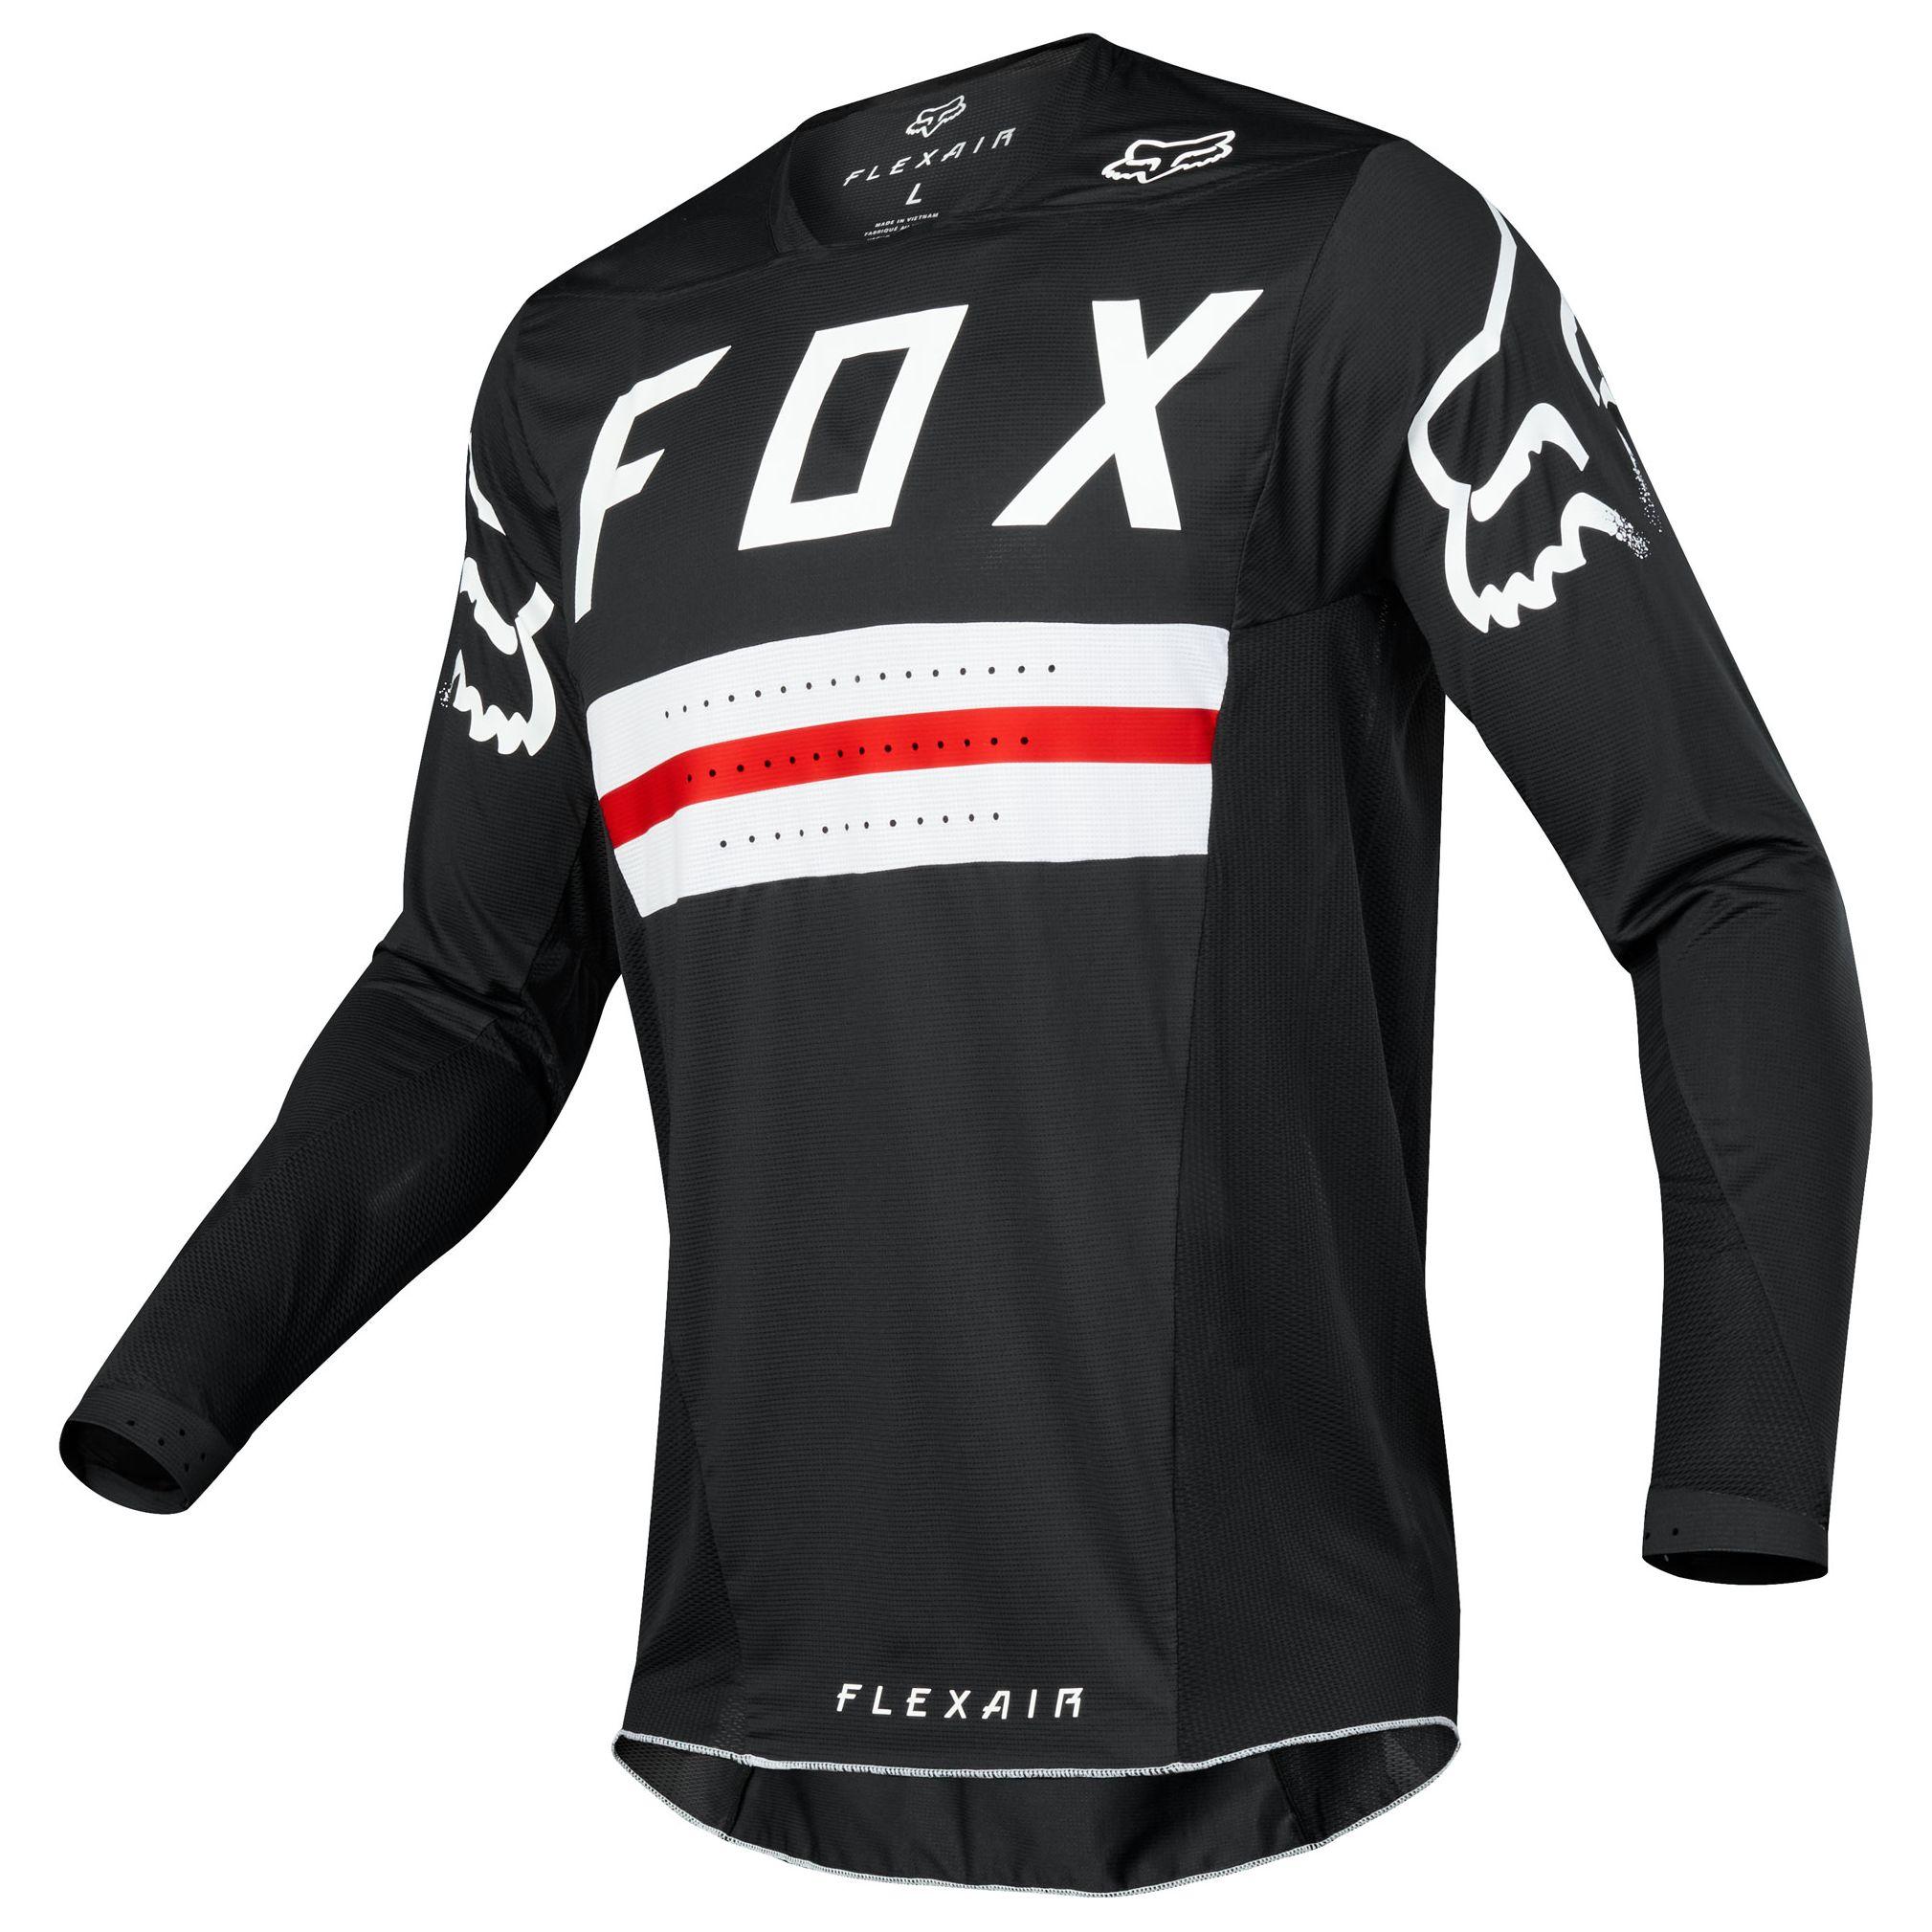 Camiseta De Motocross Fox Destockage Flexair Jersey Preest A1 Limited Edition Motoblouz Es